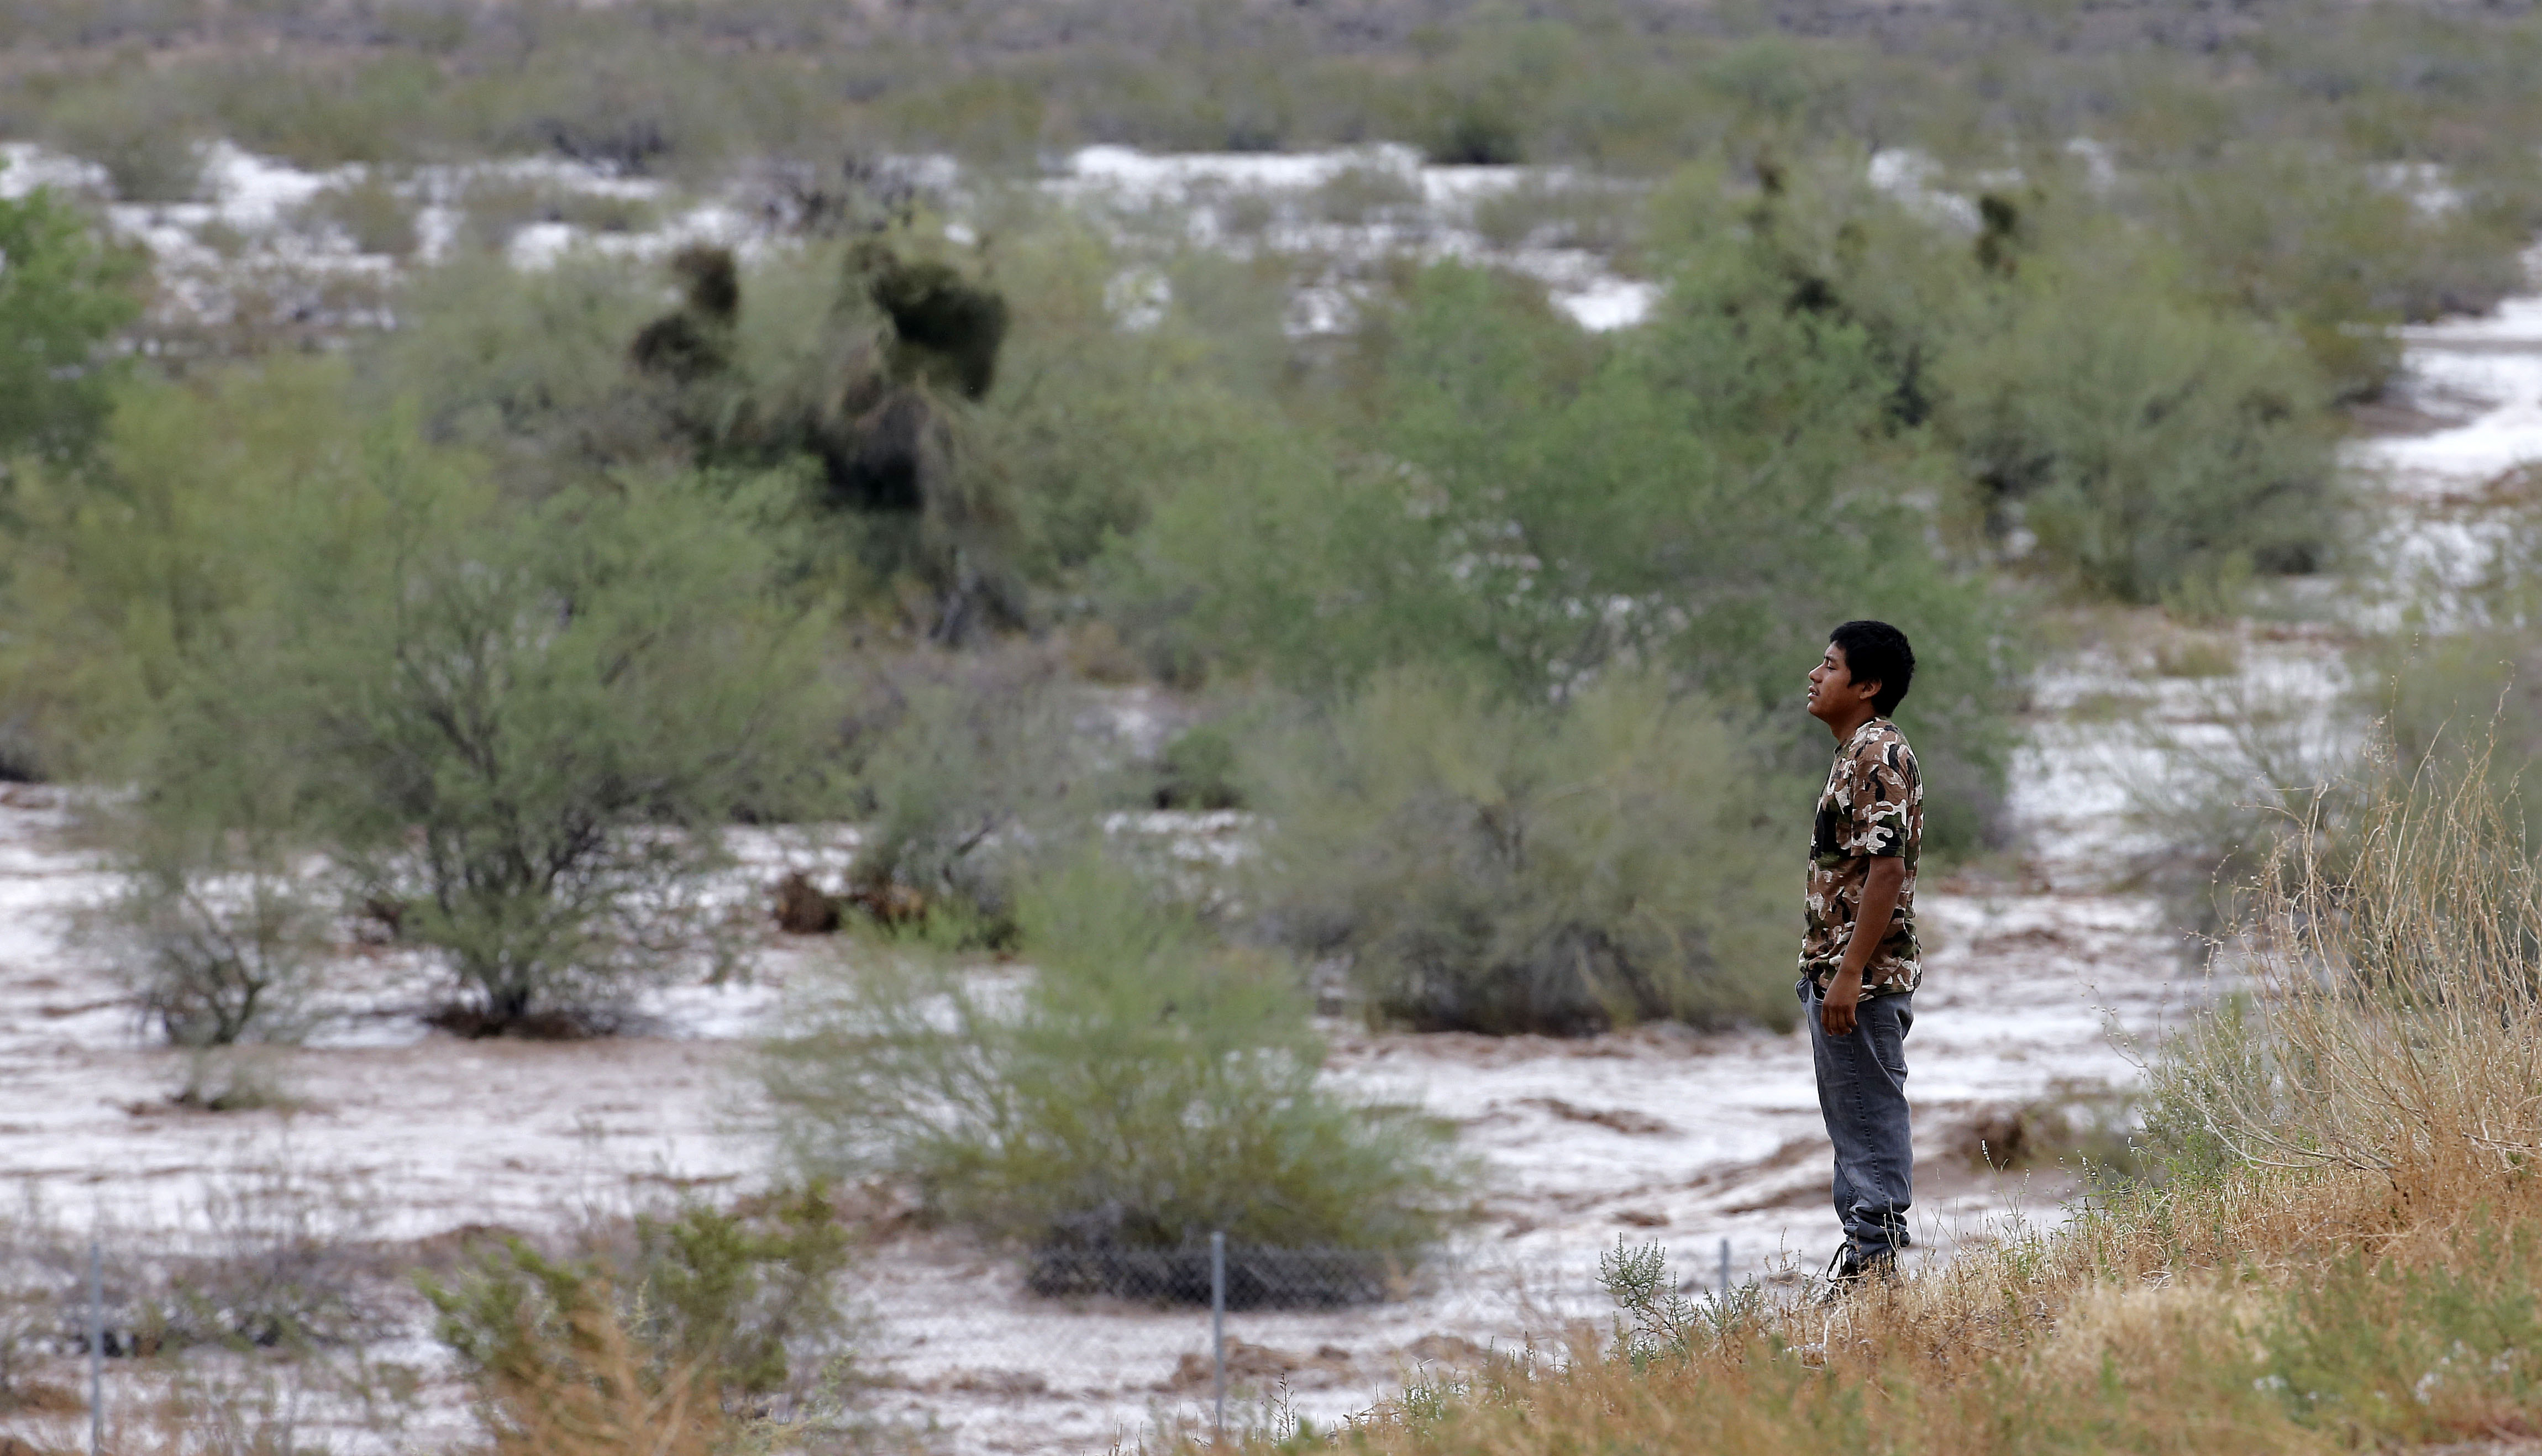 Ramiro Pantaleon watches waters from Skunk Creek through the Sonoran Desert, Aug. 19, 2014, in northwestern Phoenix.